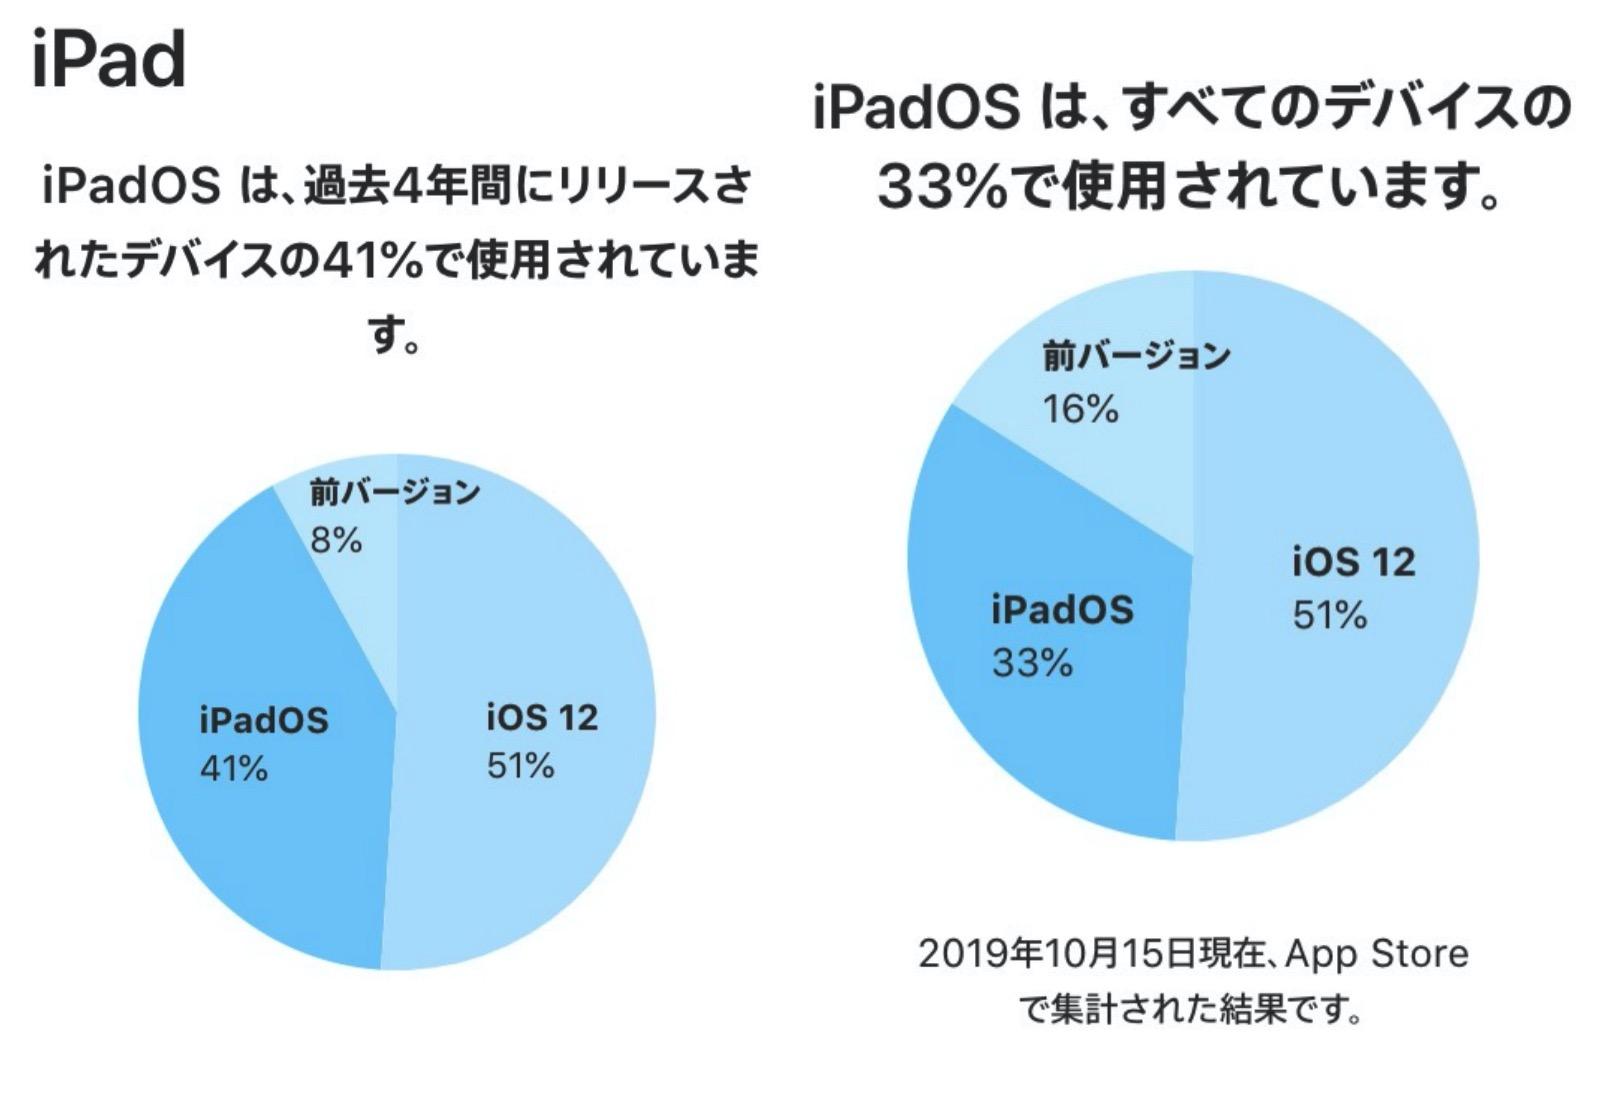 IpadOS13 Share